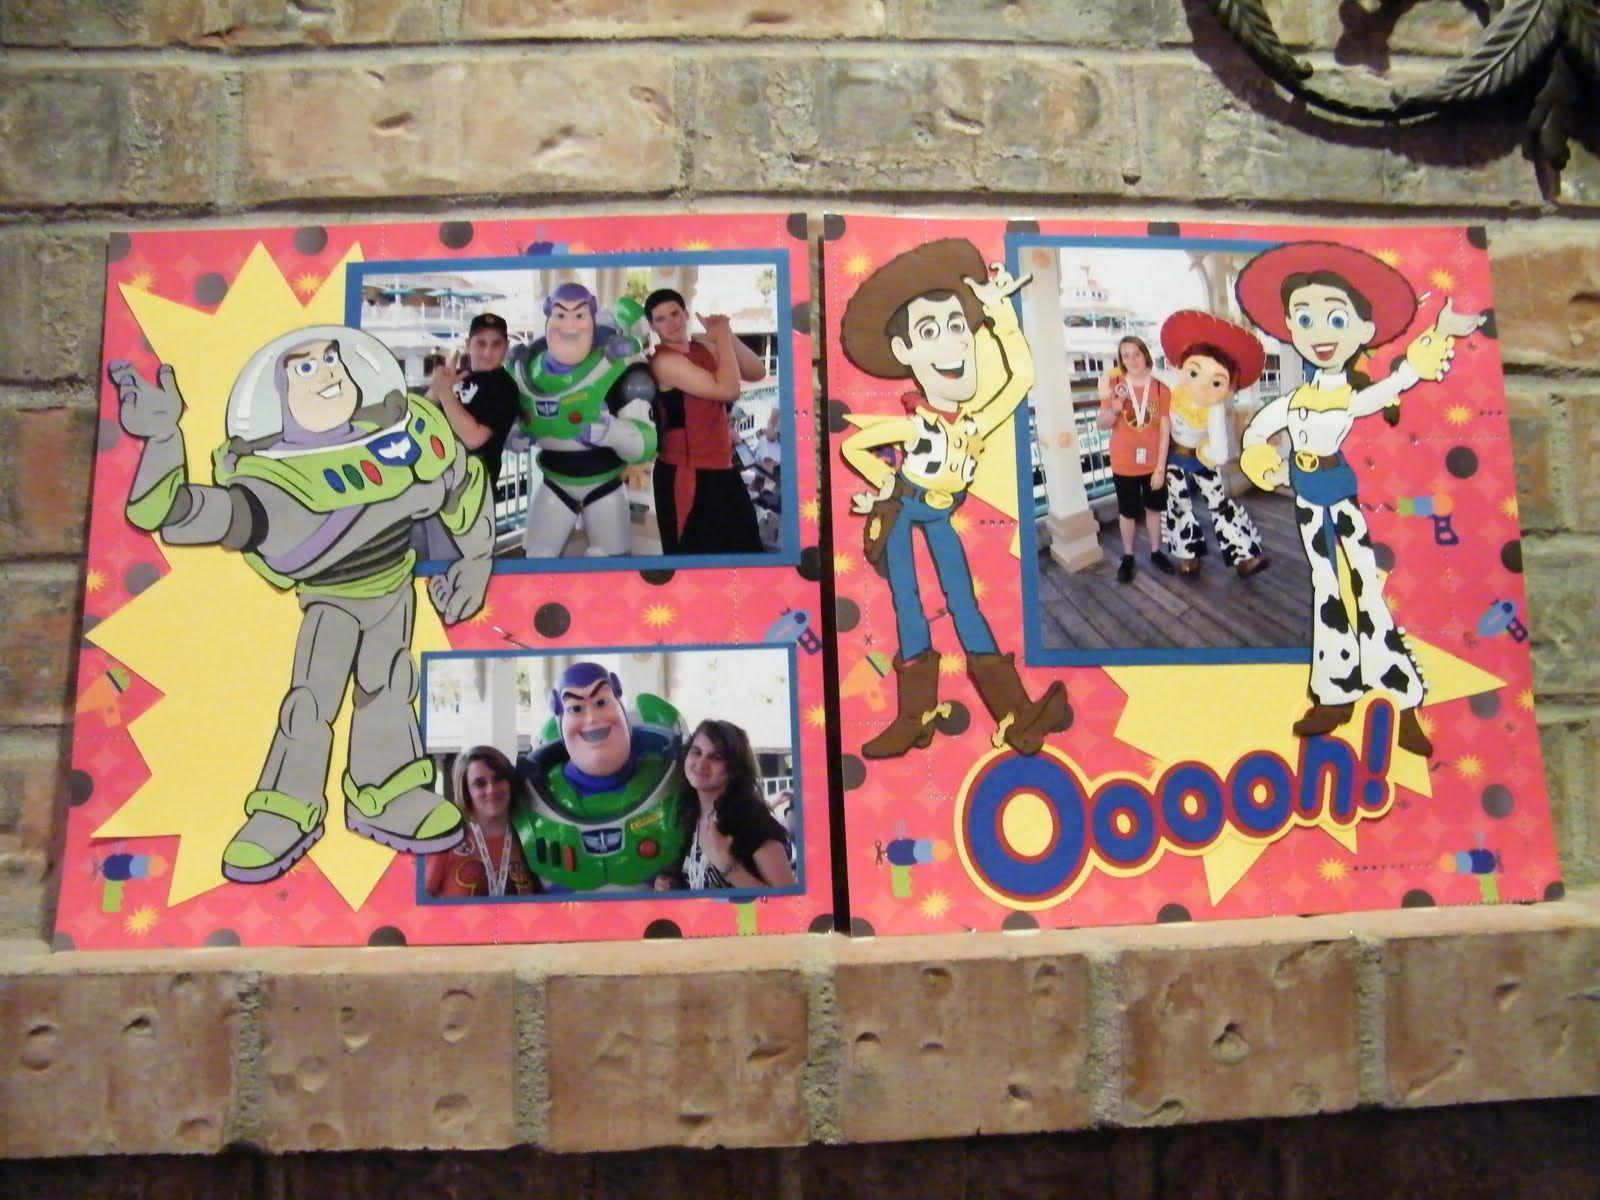 Scrapbook ideas using cricut - Toy Story Cricut Cartridge Created Using Cricut Toy Story Cartridge Disney Scrapbookscrapbook Layoutstoy